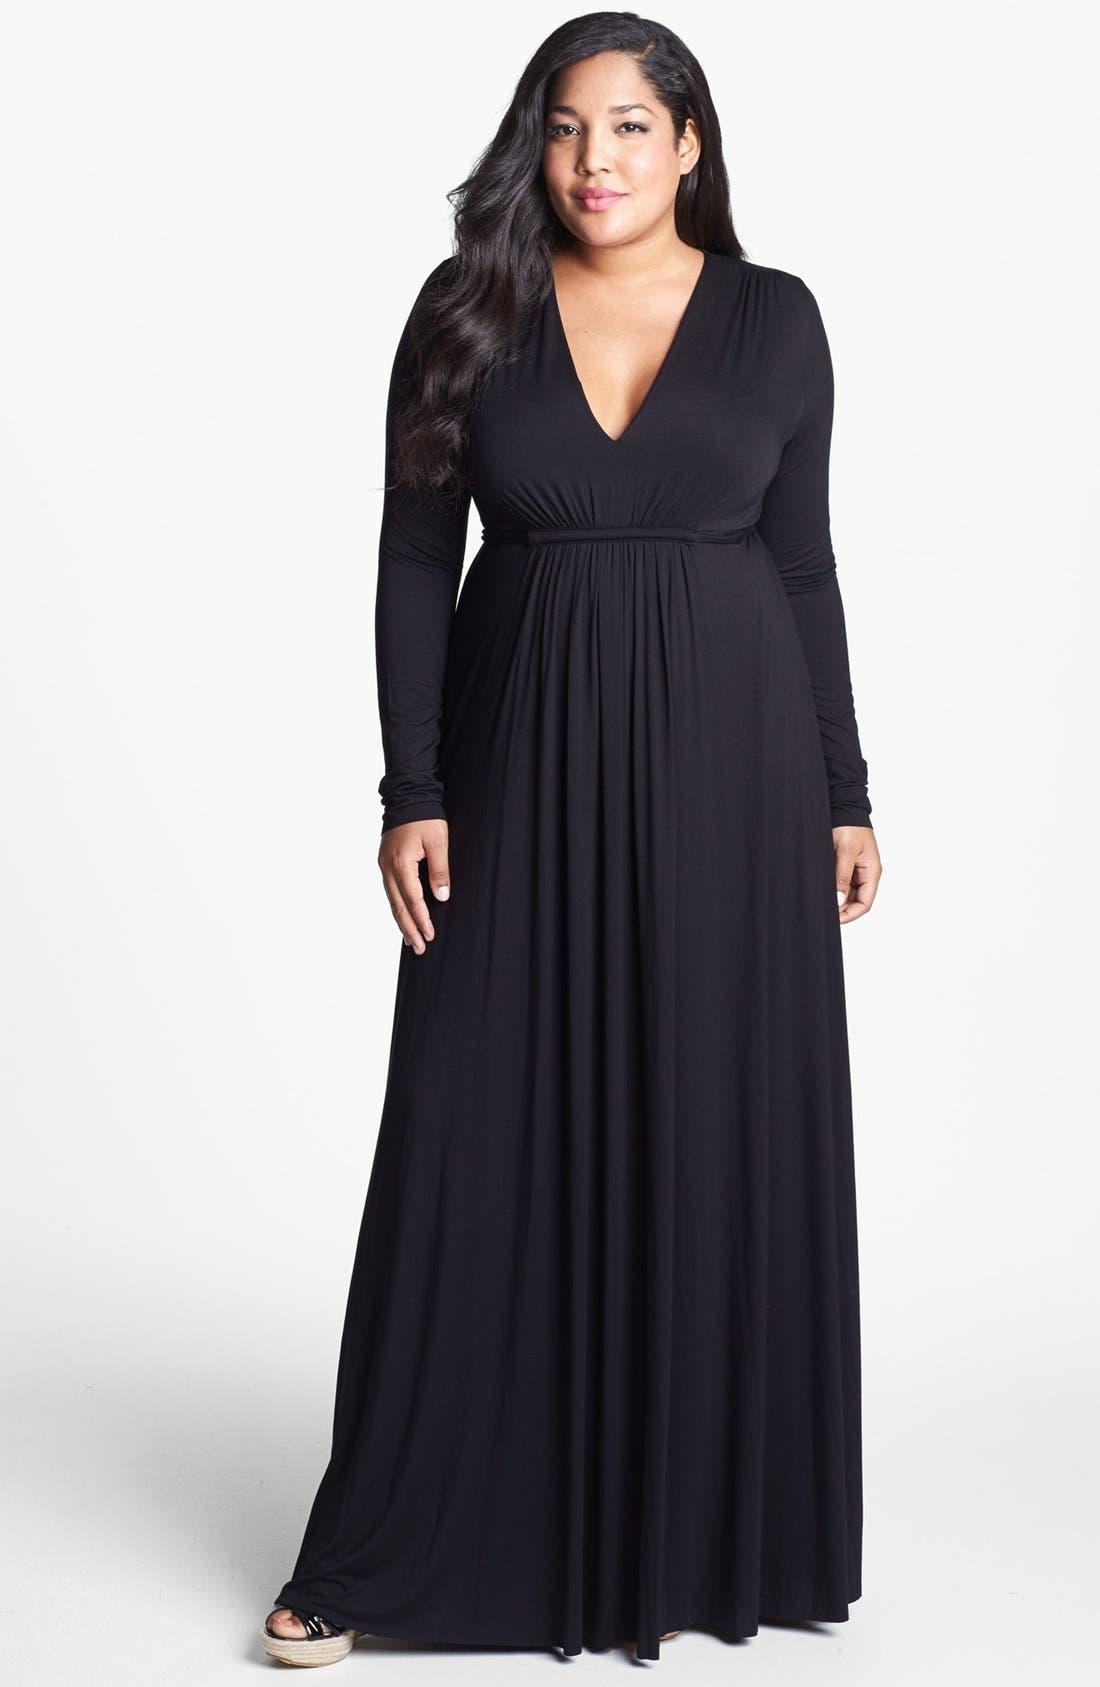 Alternate Image 1 Selected - Rachel Pally Caftan Maxi Dress (Plus Size)